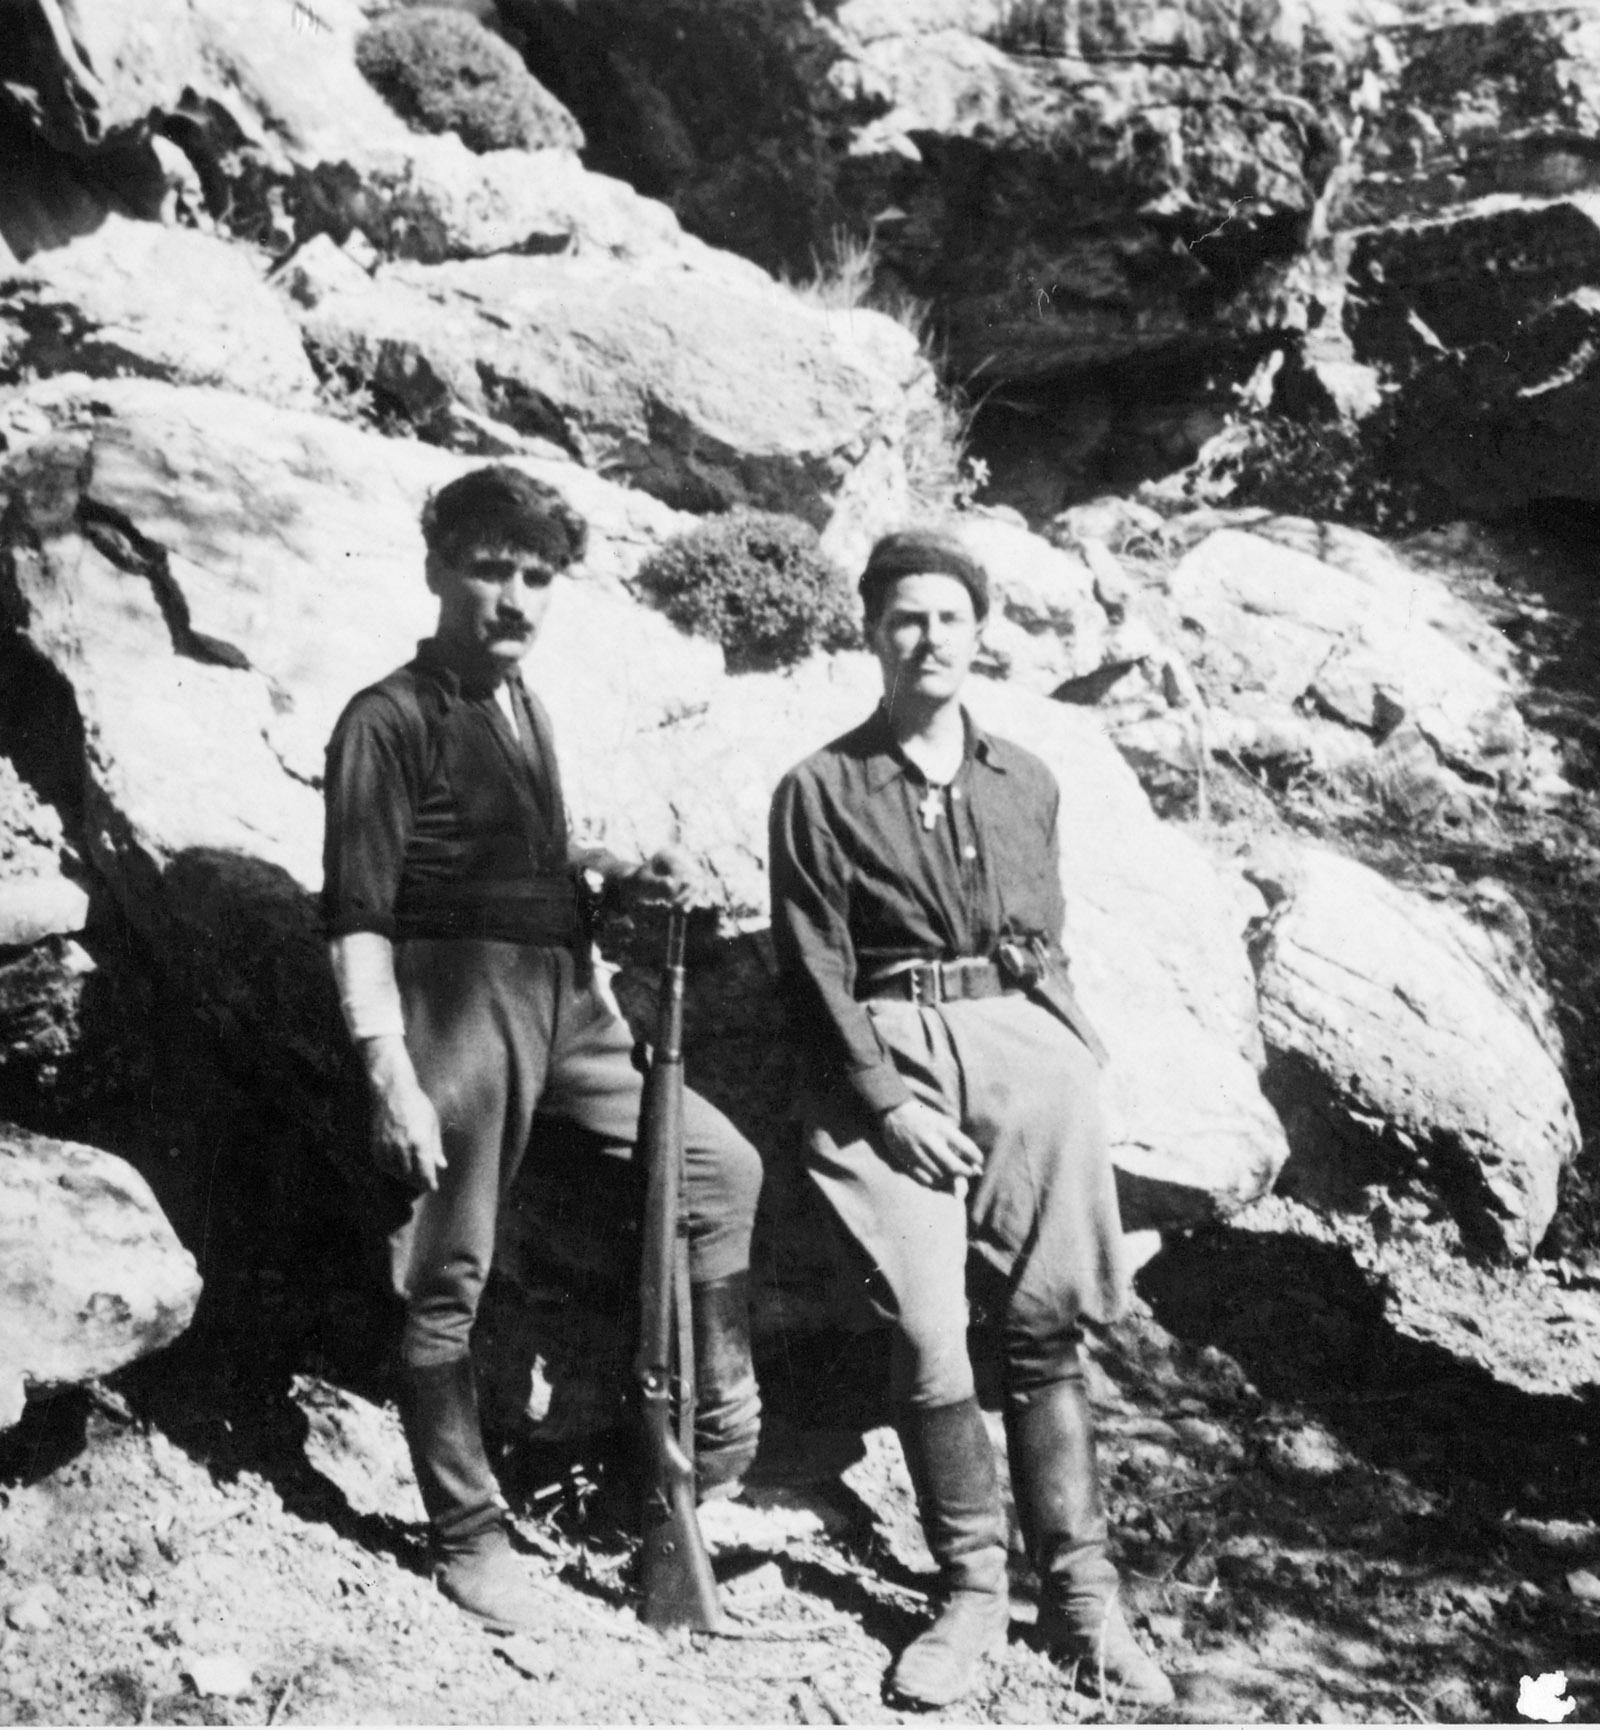 Patrick Leigh Fermor and Yanni Tsangarakis, Hordaki, Crete